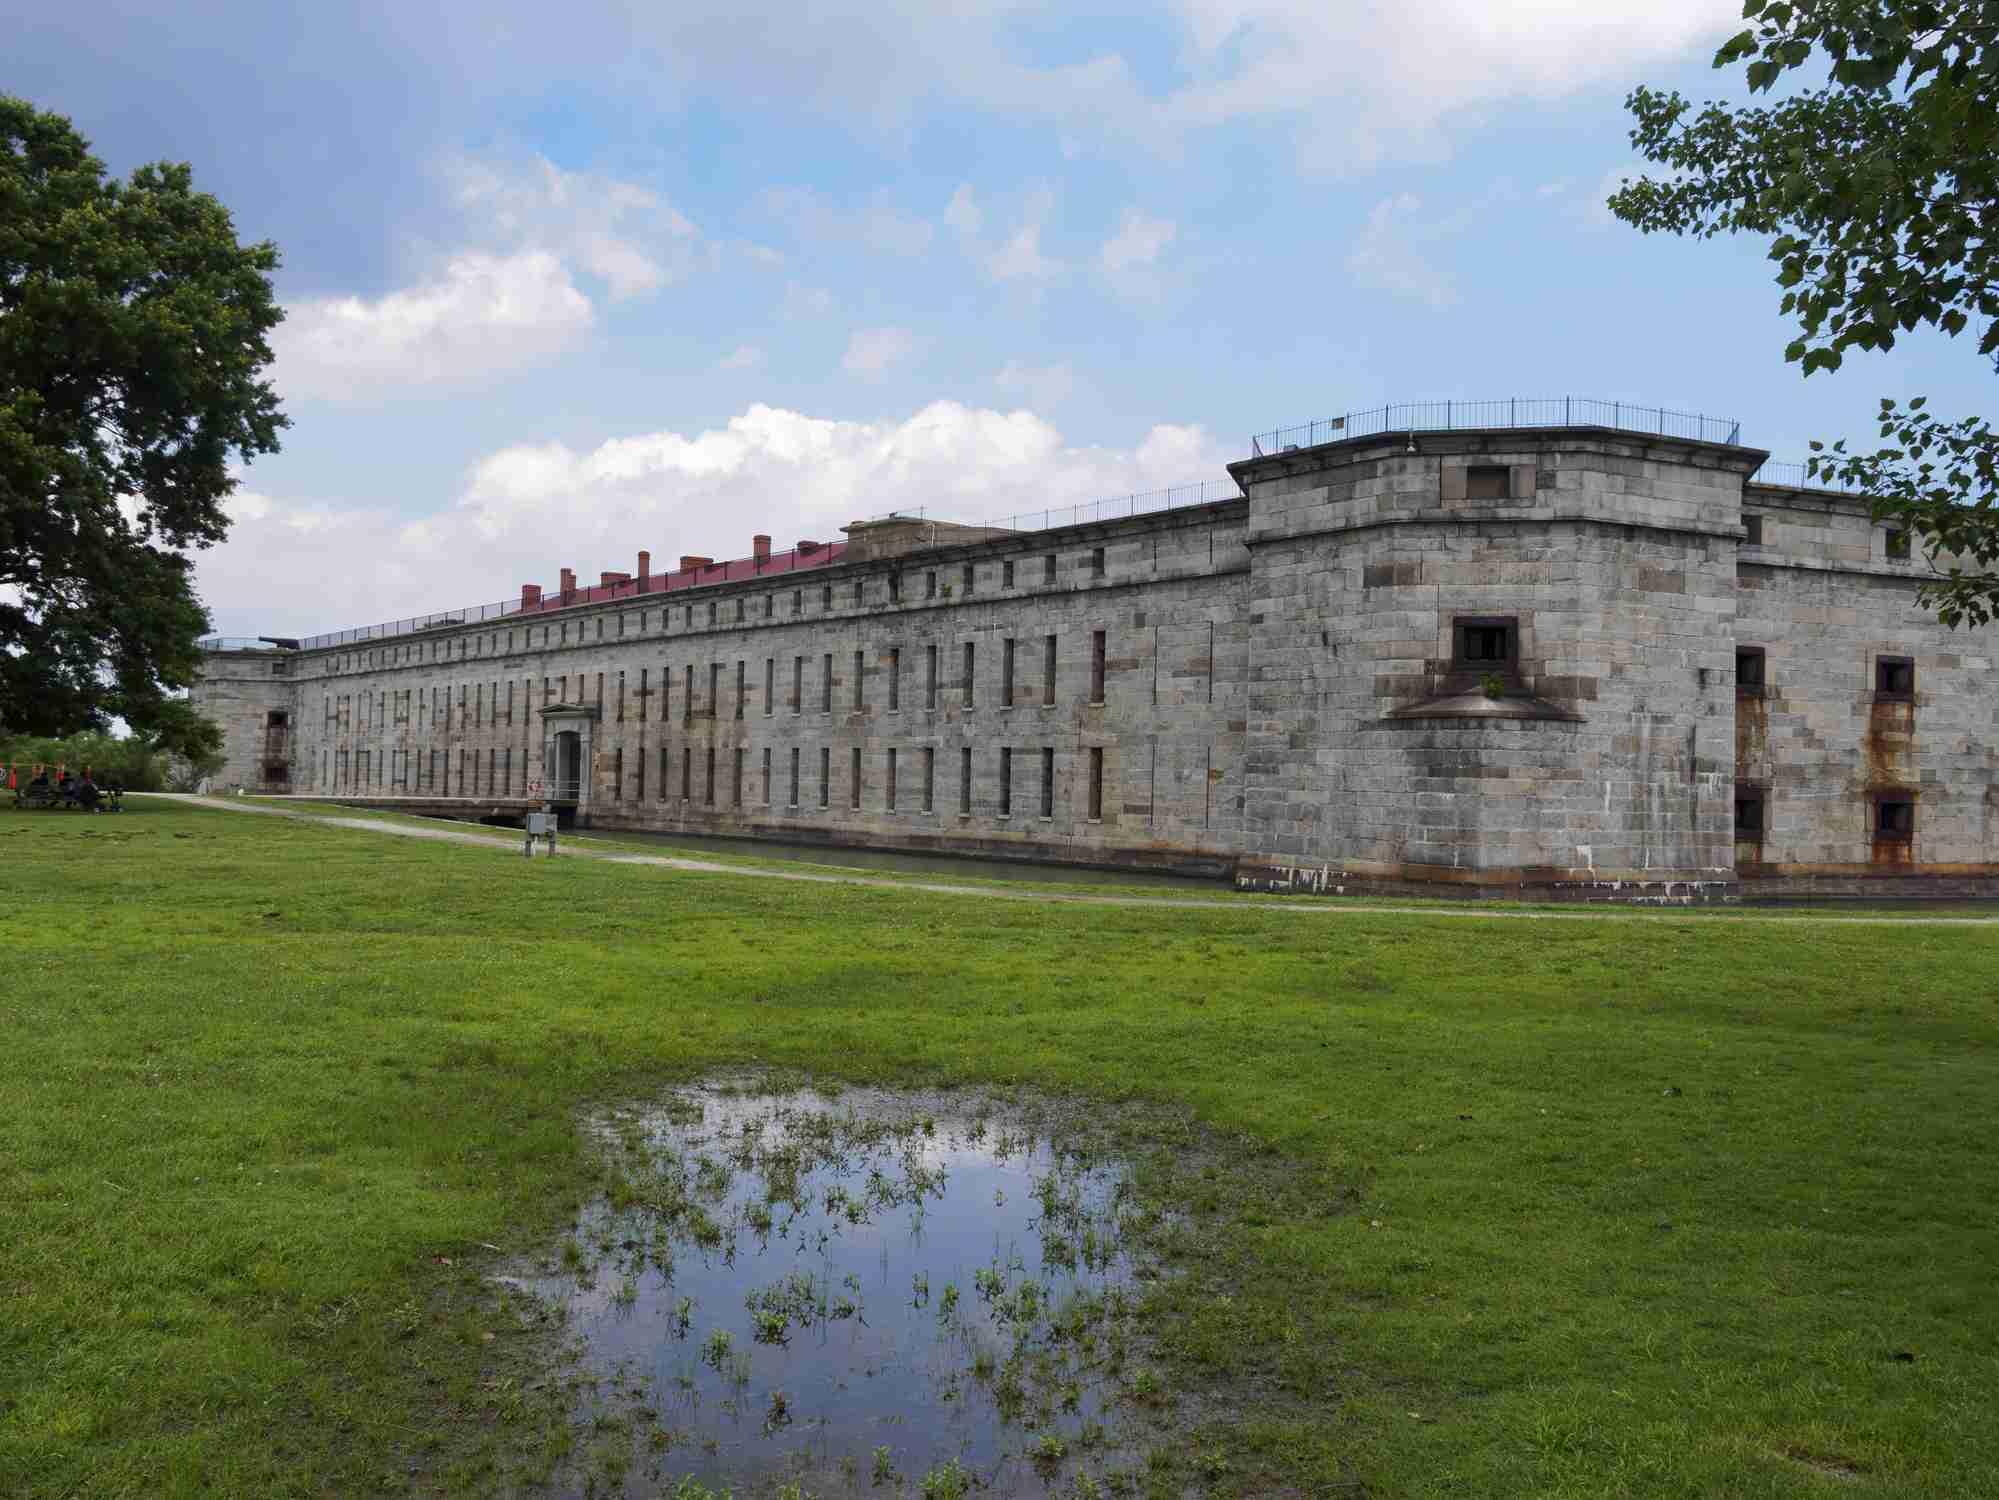 Fort Delaware, Pea Patch Island, Delaware